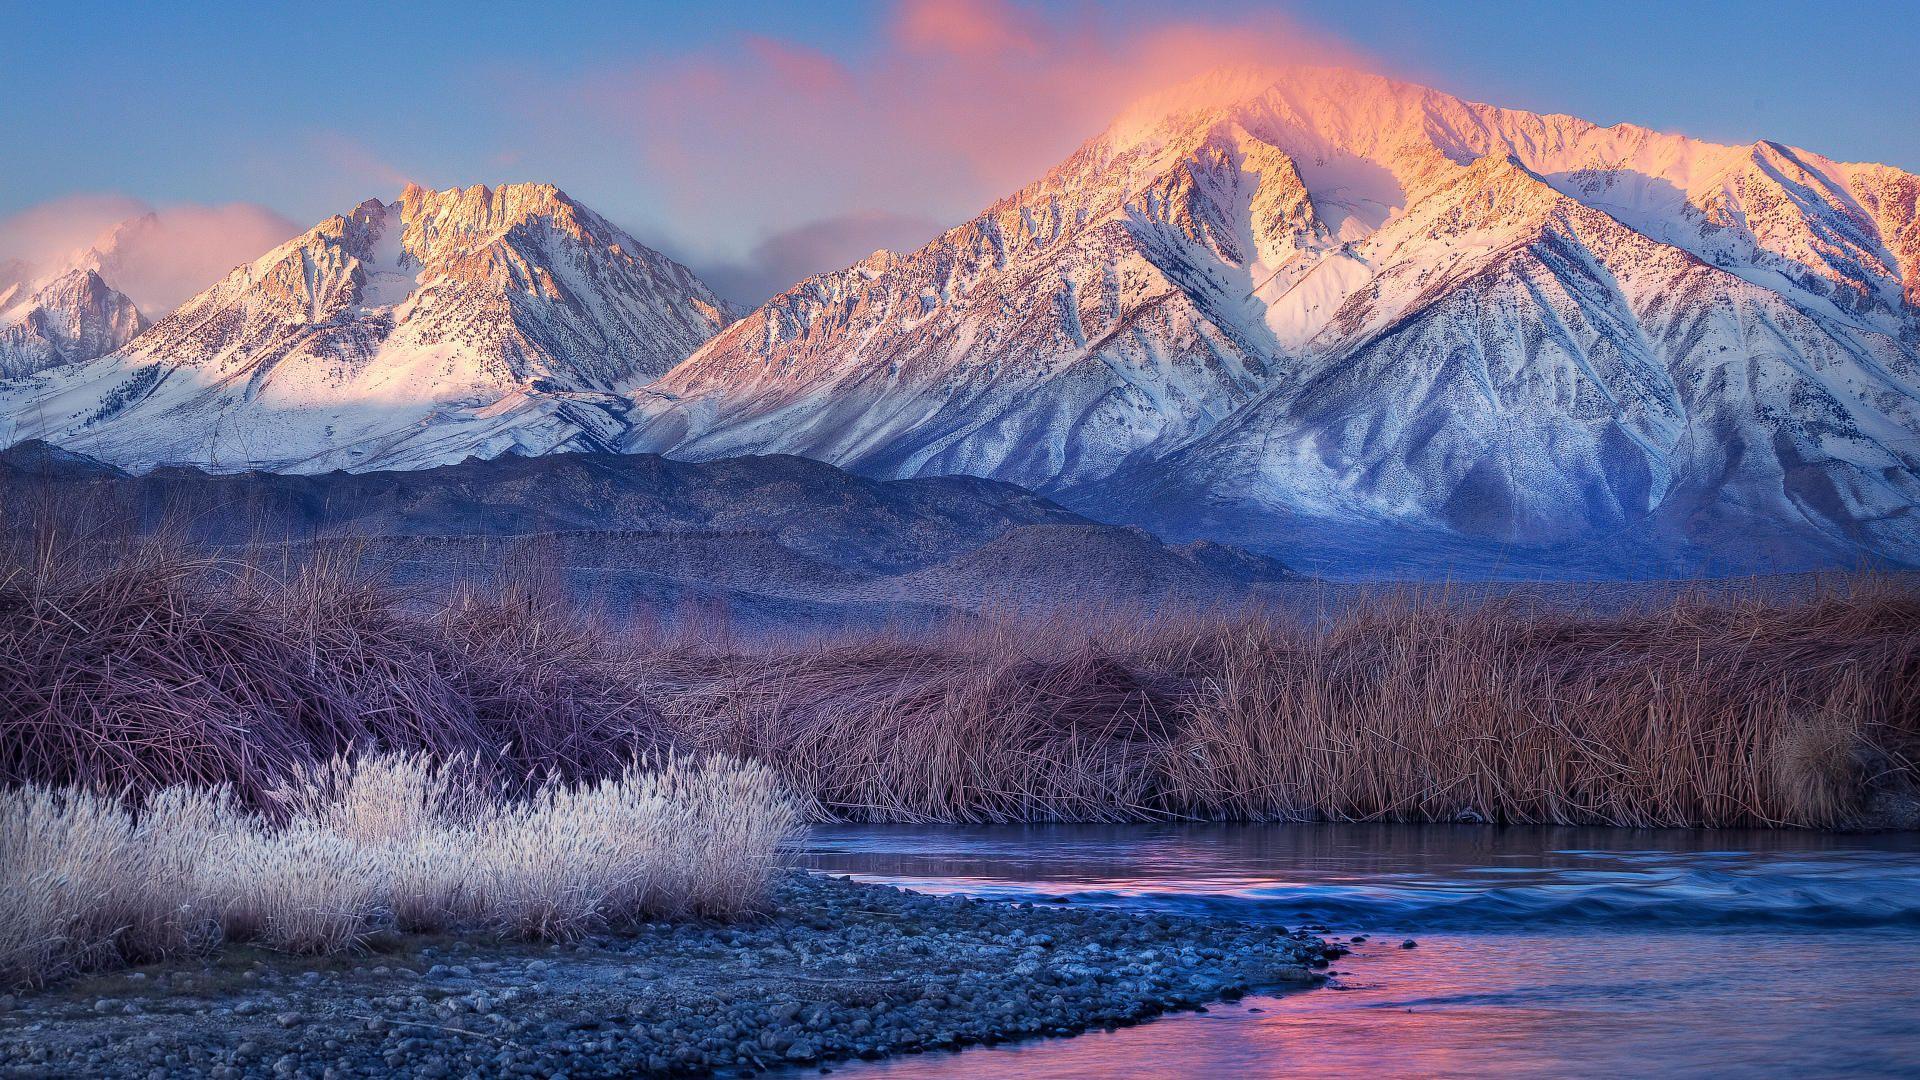 Winter mountain desktop wallpapers top free winter for Sfondi invernali desktop